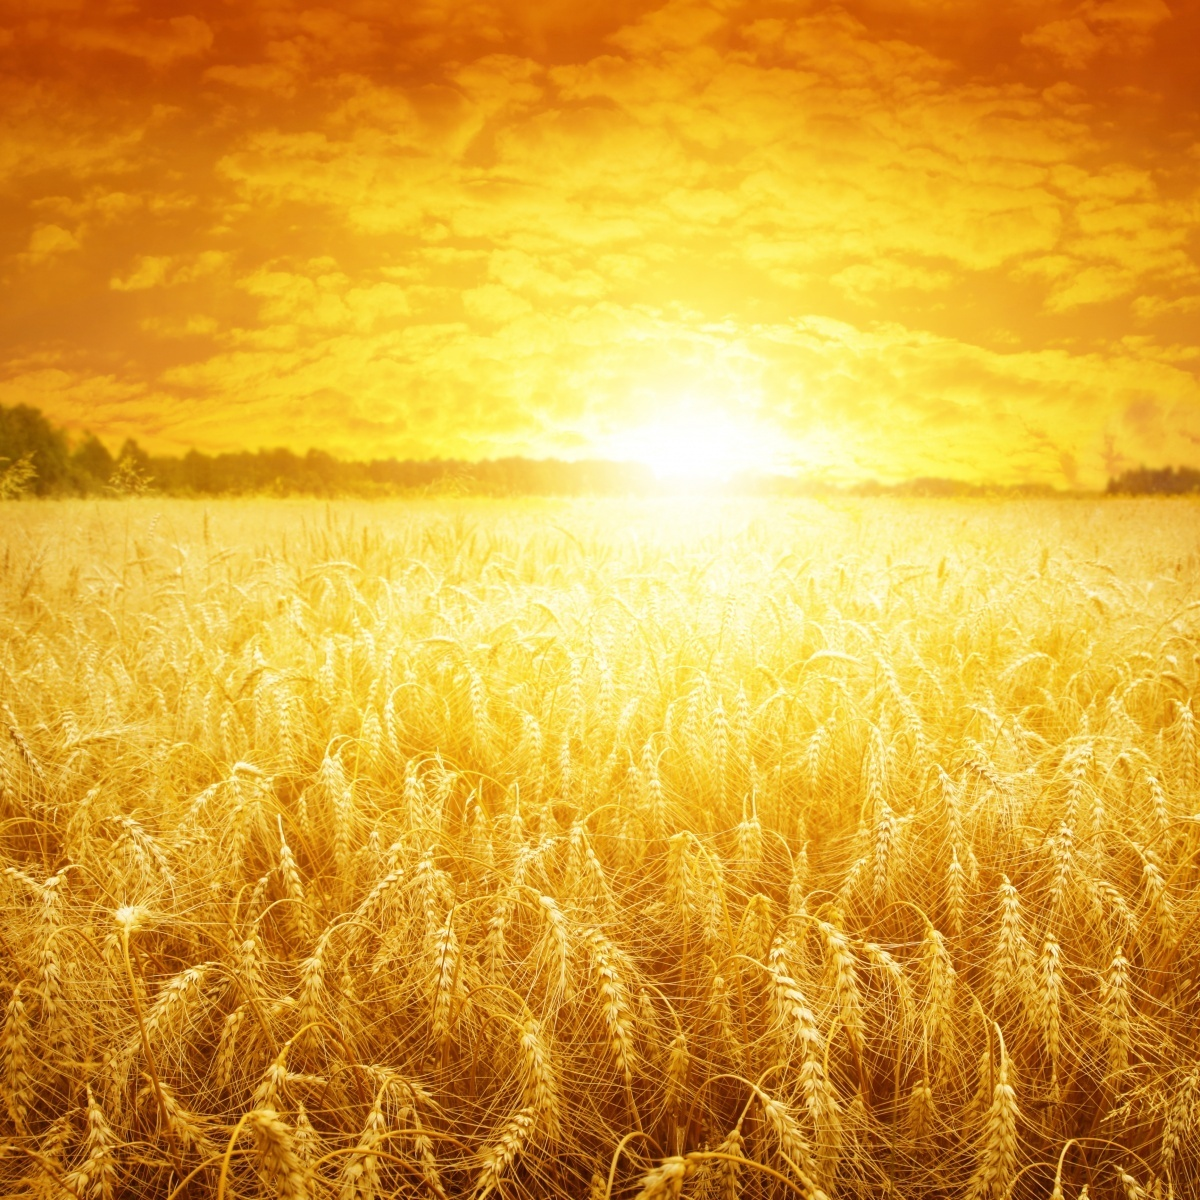 Пшеничное поле - Wheat field